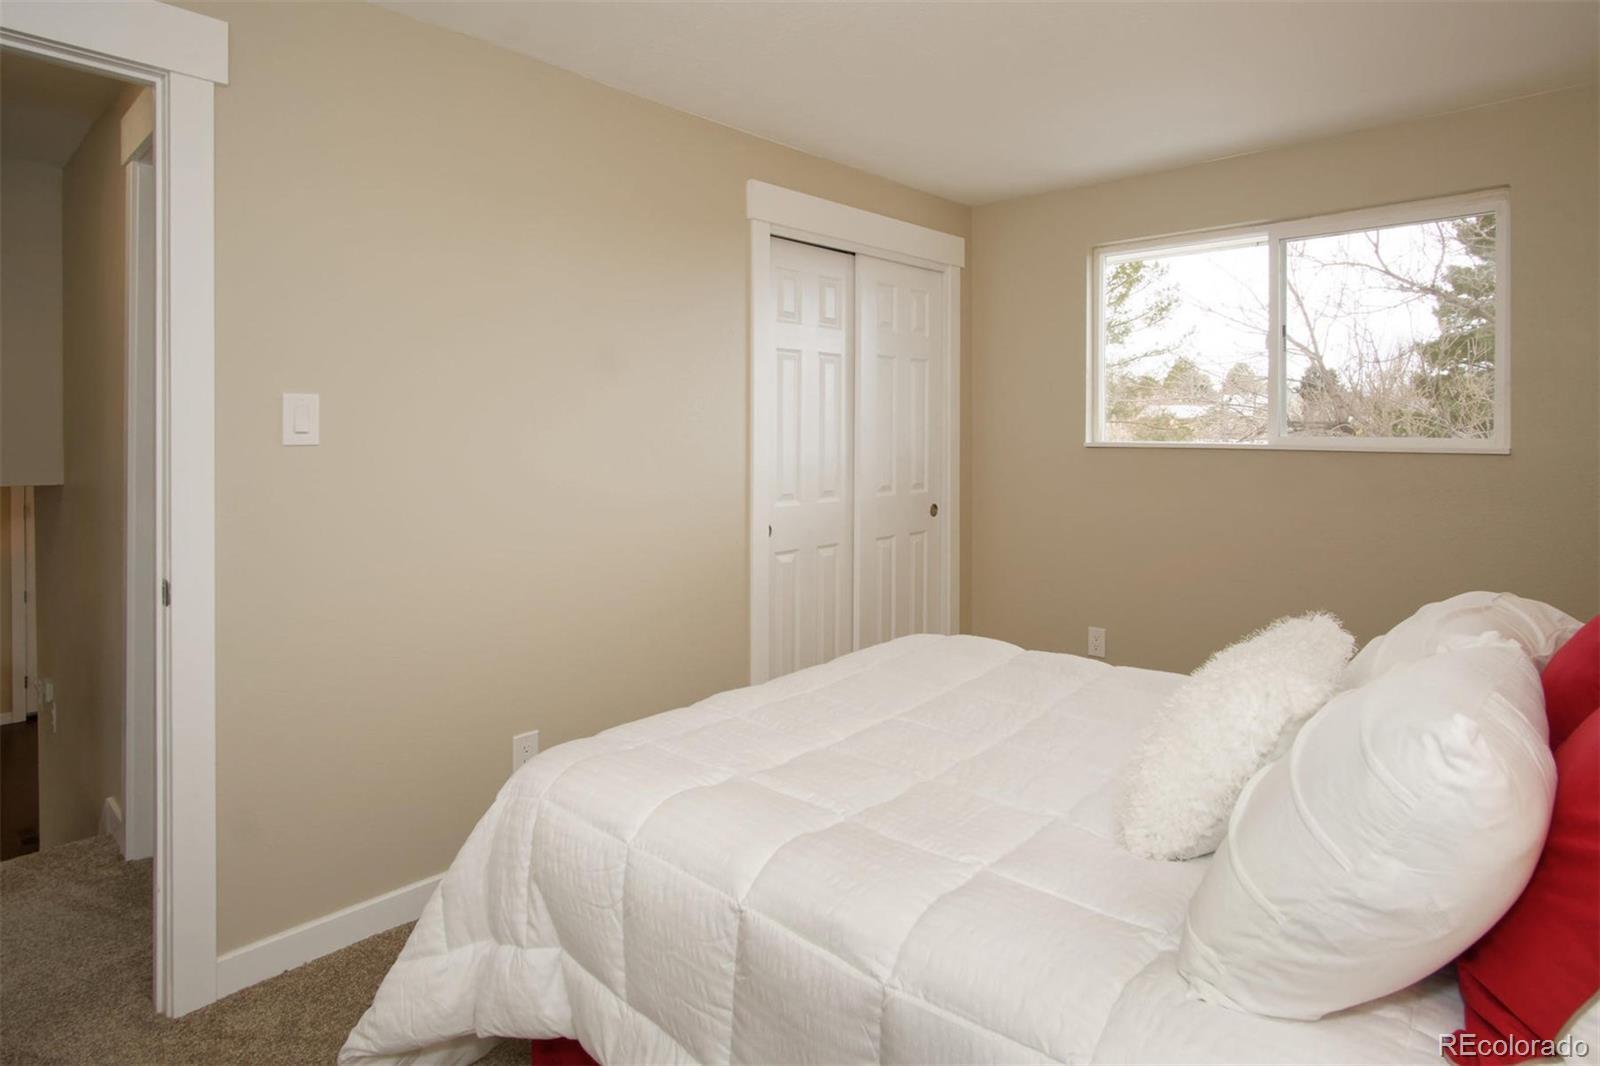 MLS# 5620602 - 15 - 13245 Deneb Drive, Littleton, CO 80124